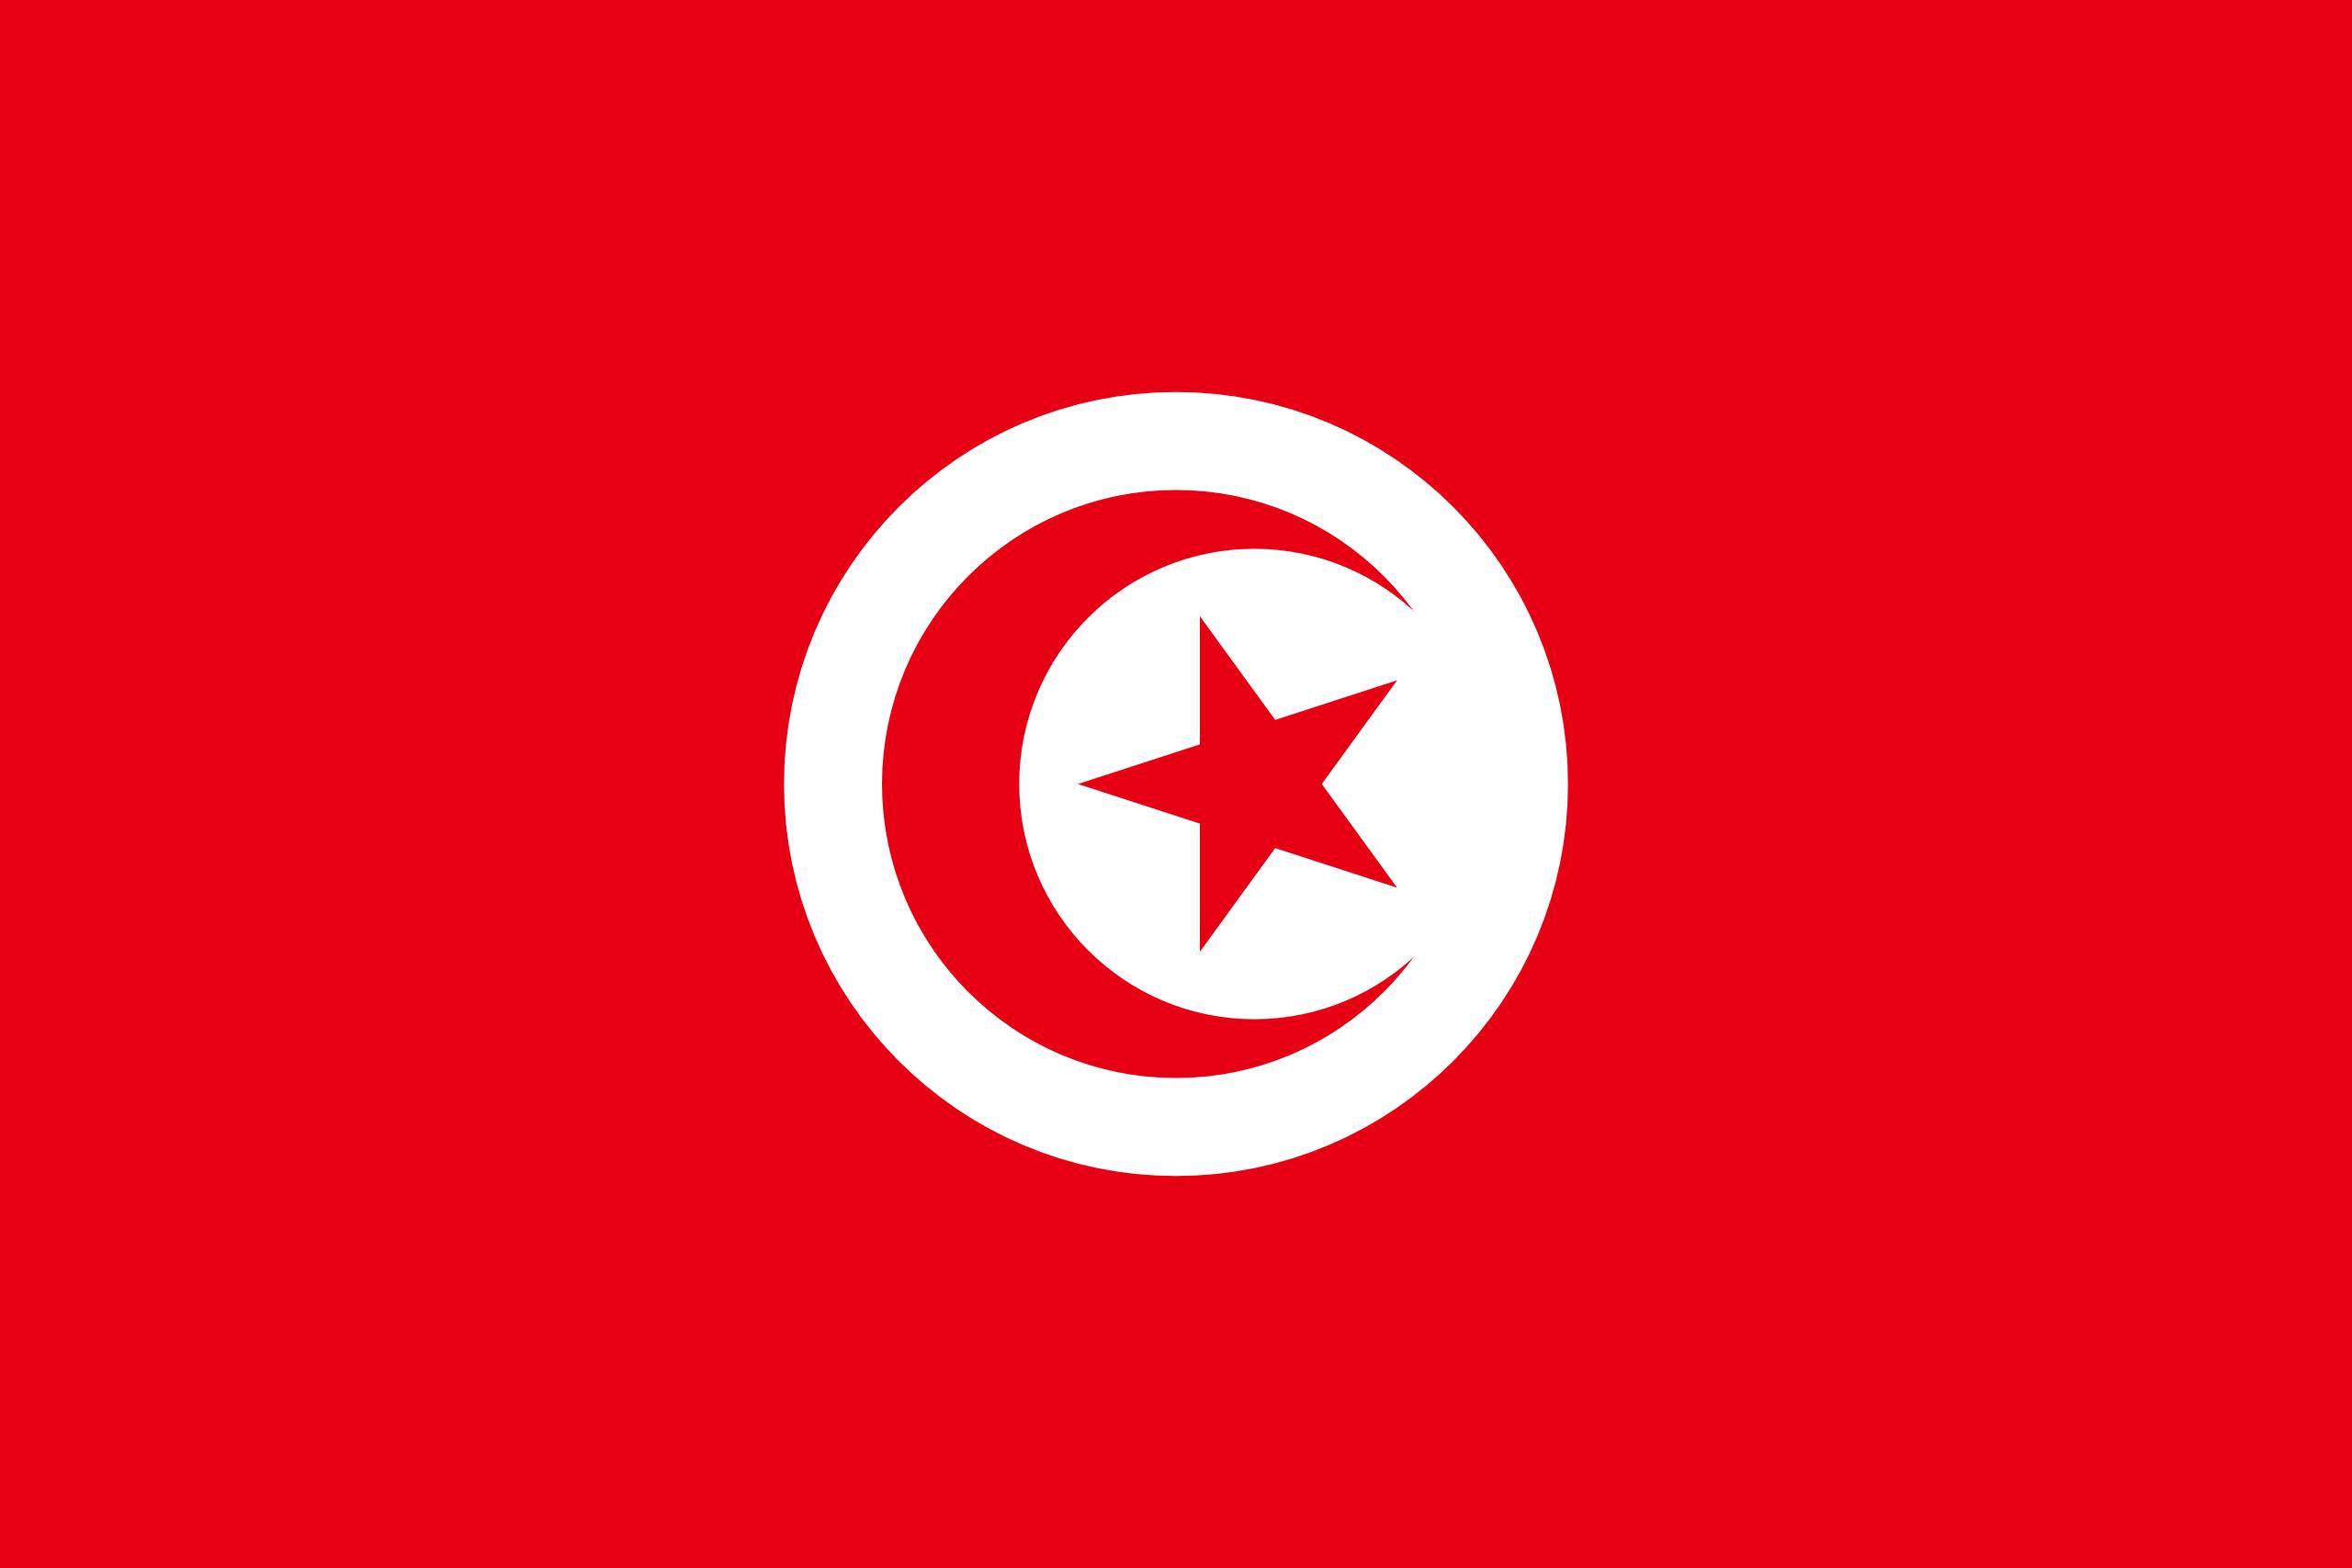 Tunisie, pays, emblème, logo, symbole - Fonds d'écran HD - Professor-falken.com